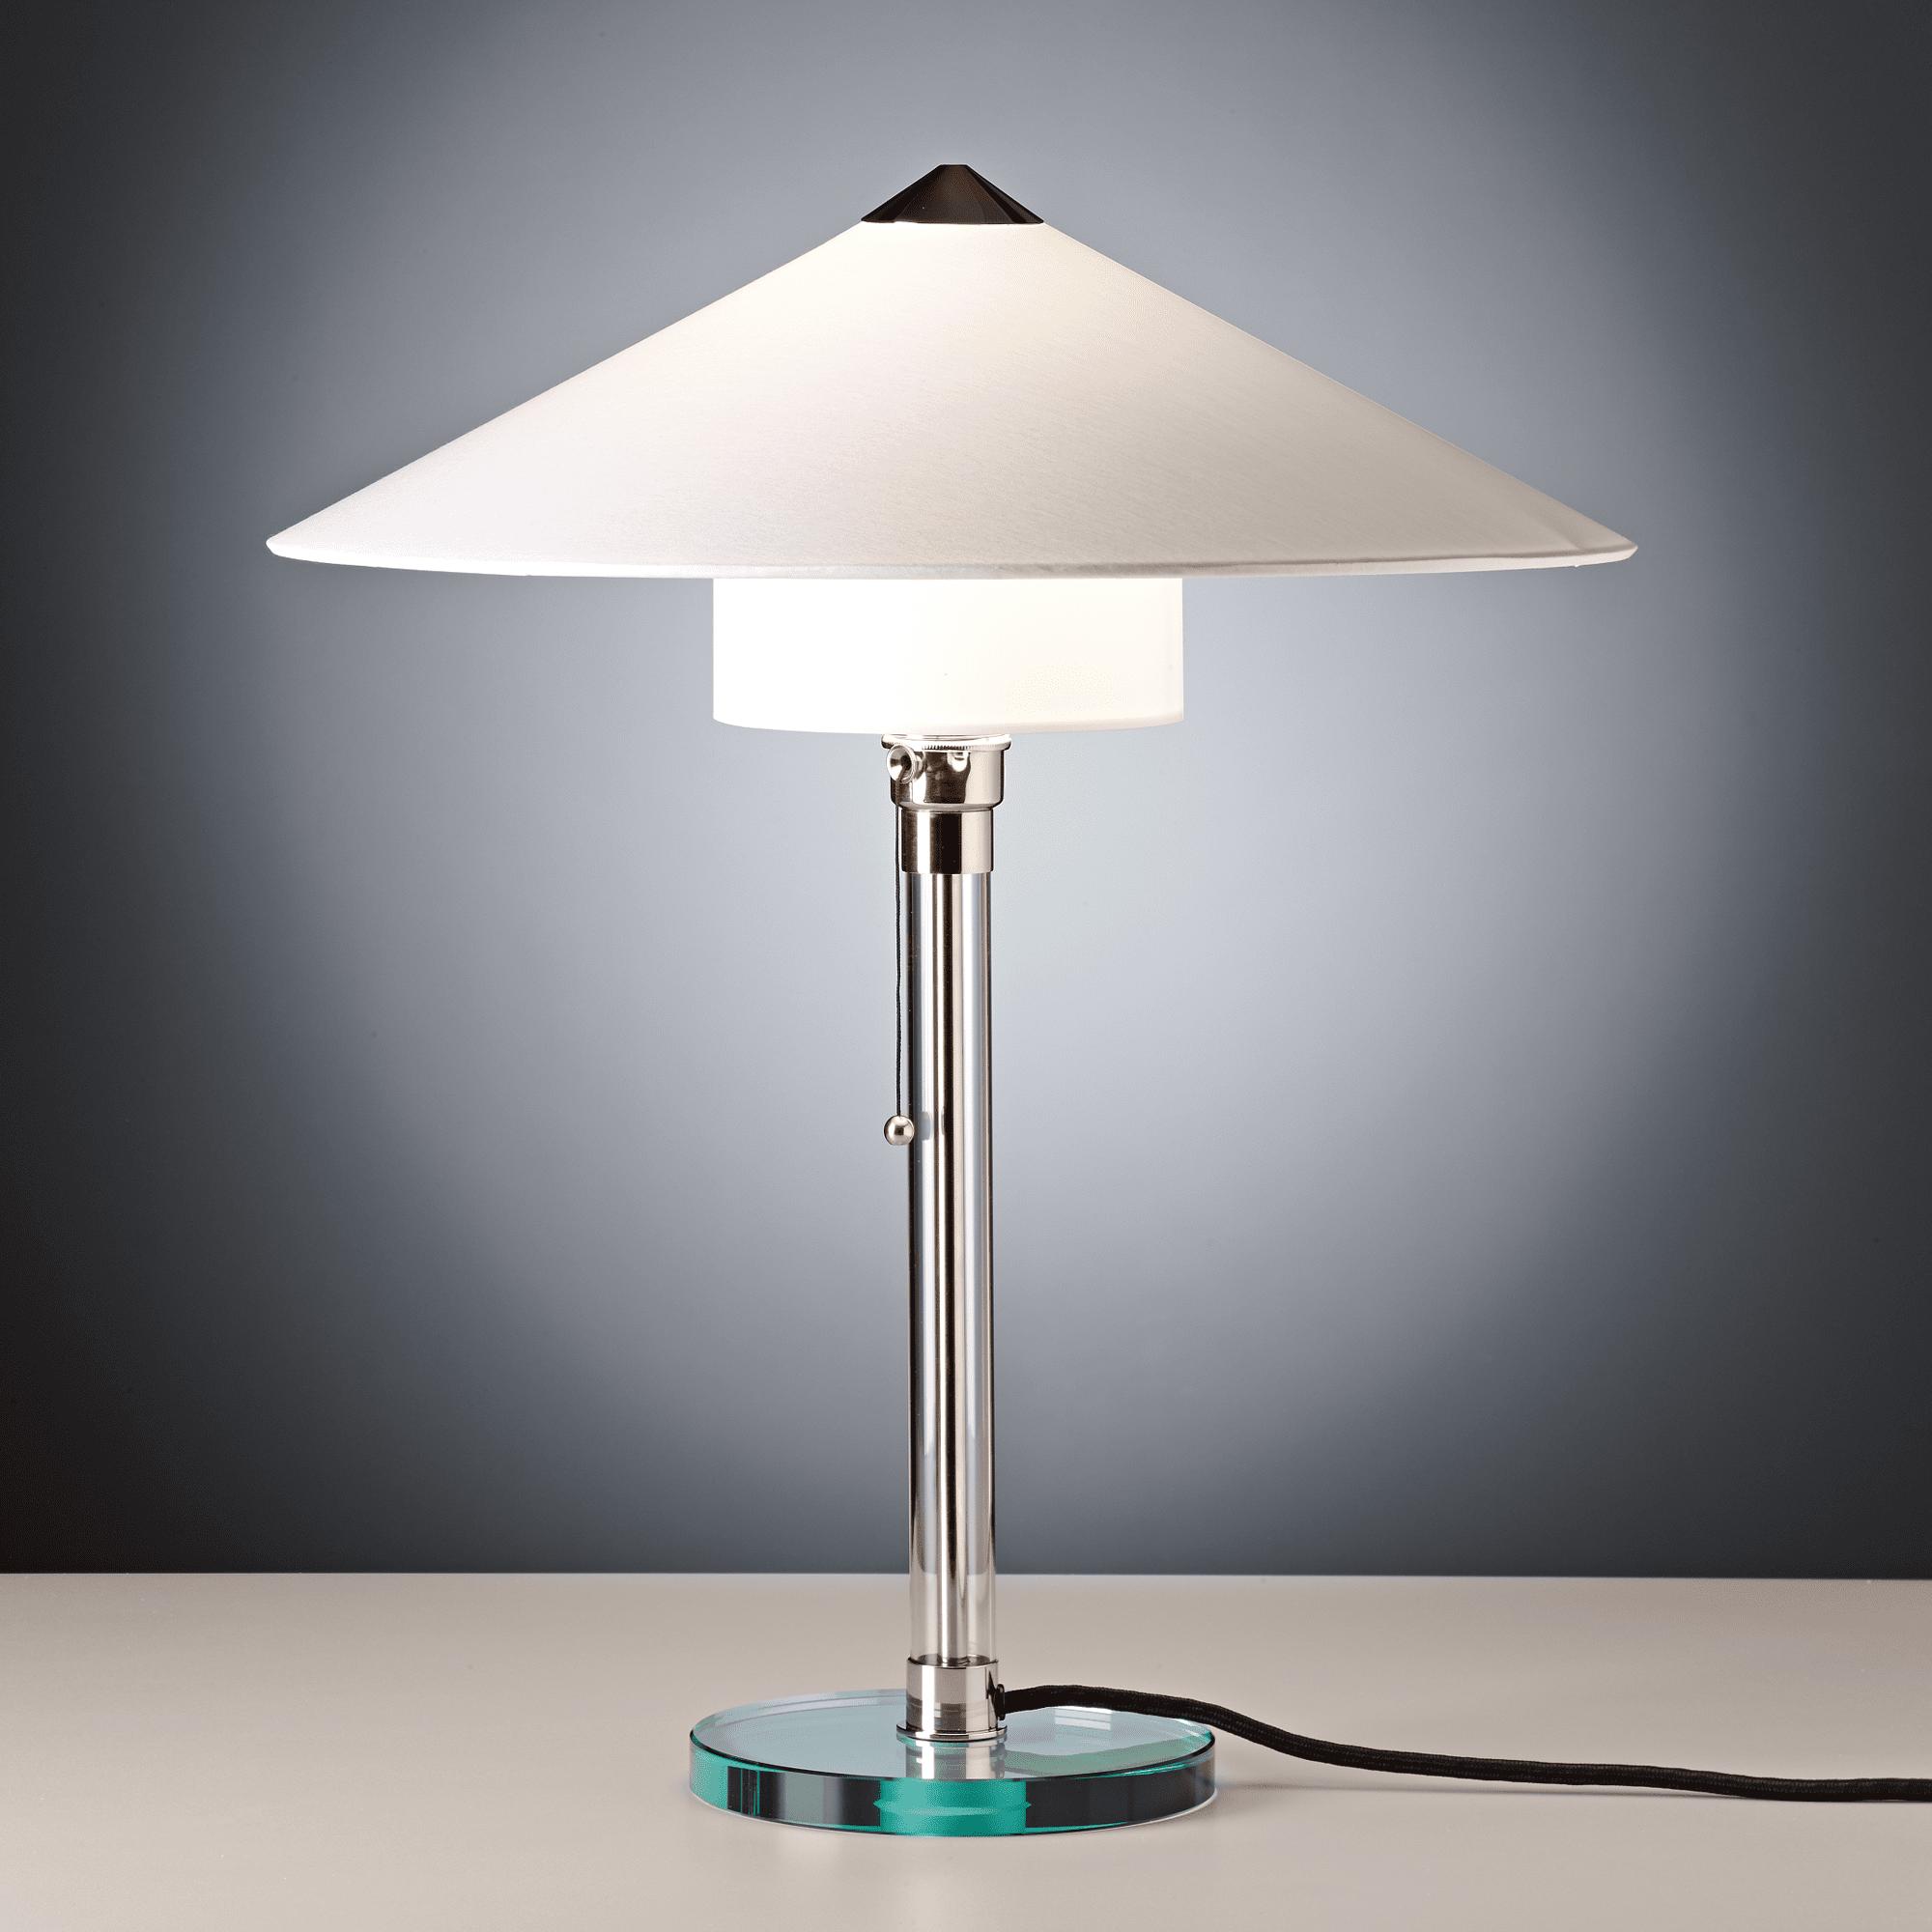 Wagenfeld Table Lamp WG 27. Bauhaus